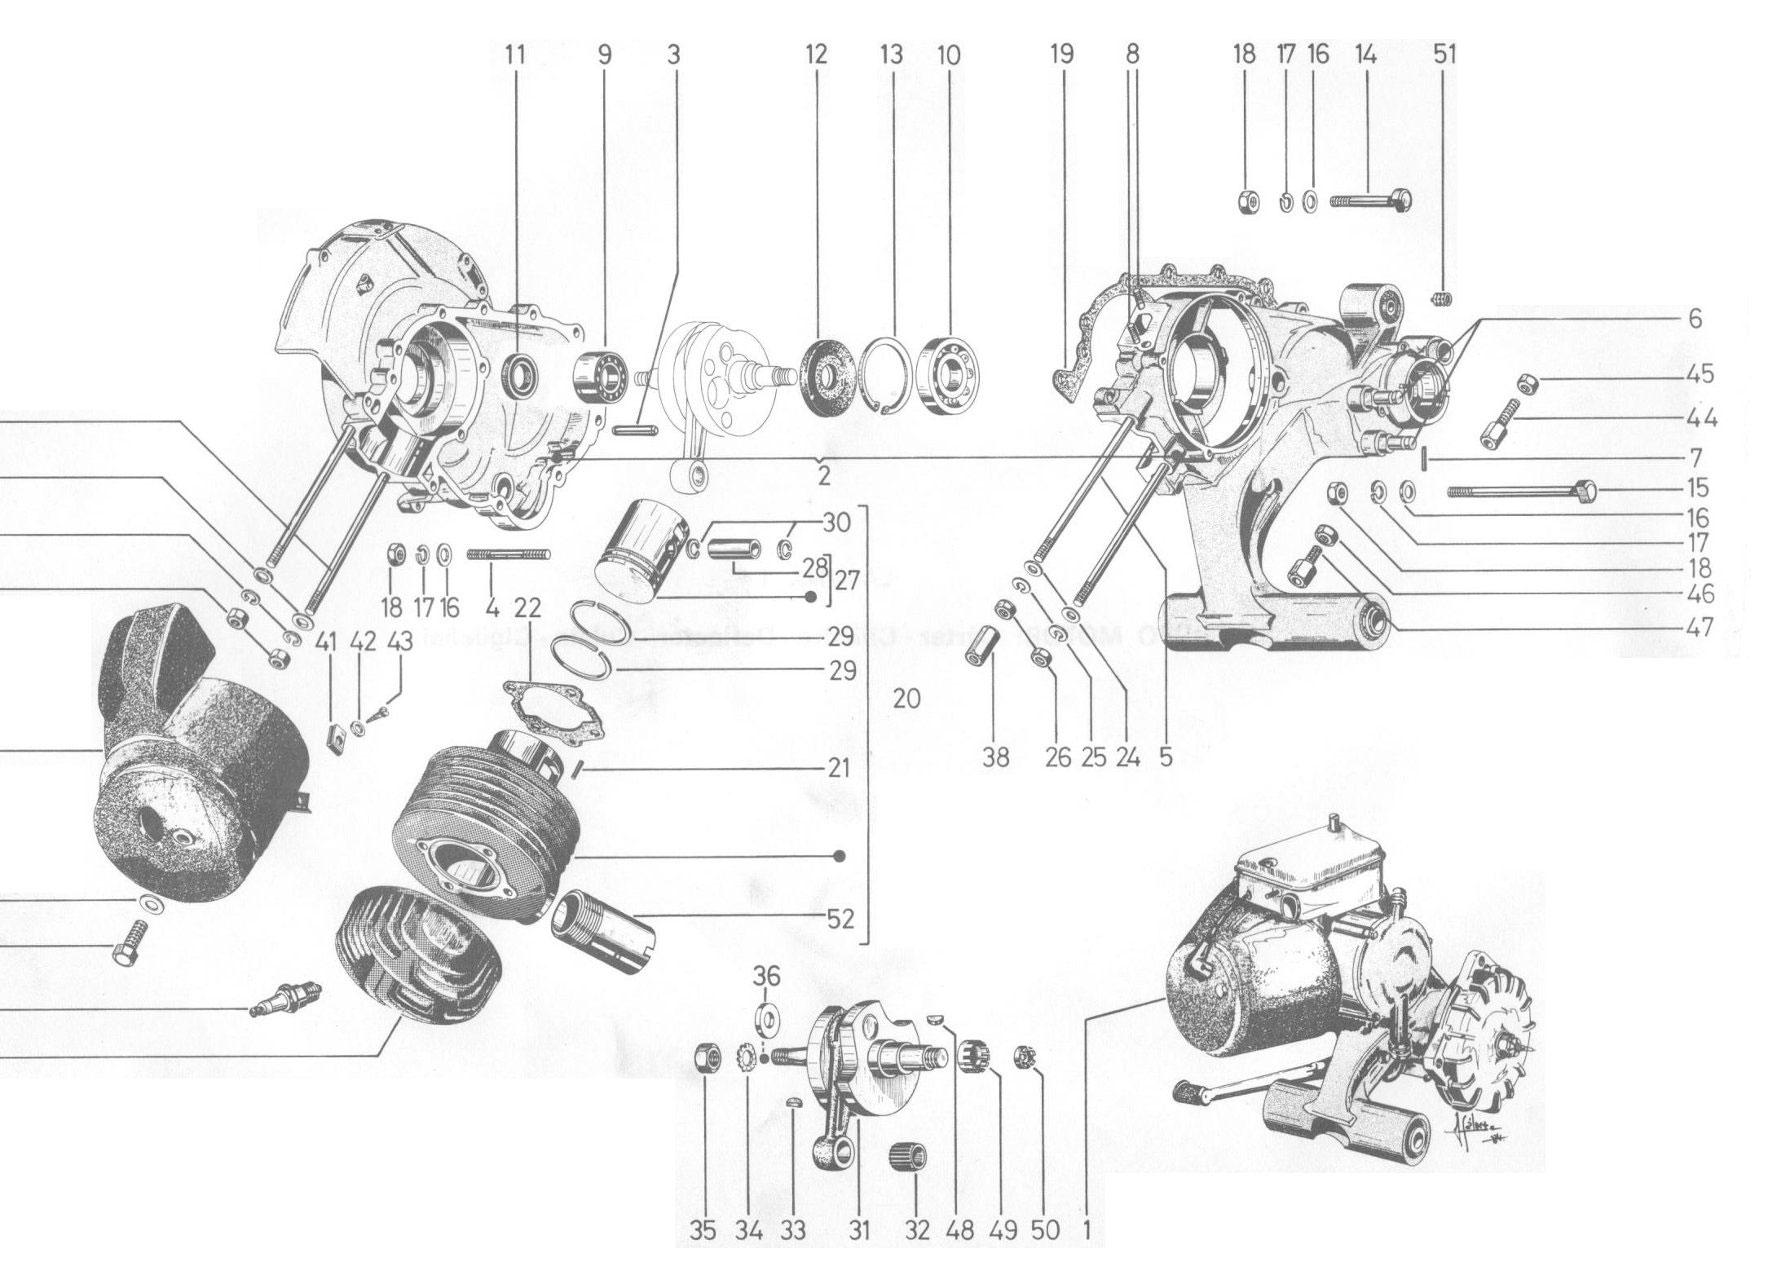 GRUPO MOTOR:CARTER-CILINDRO-CULATA-CIGÜEÑAL